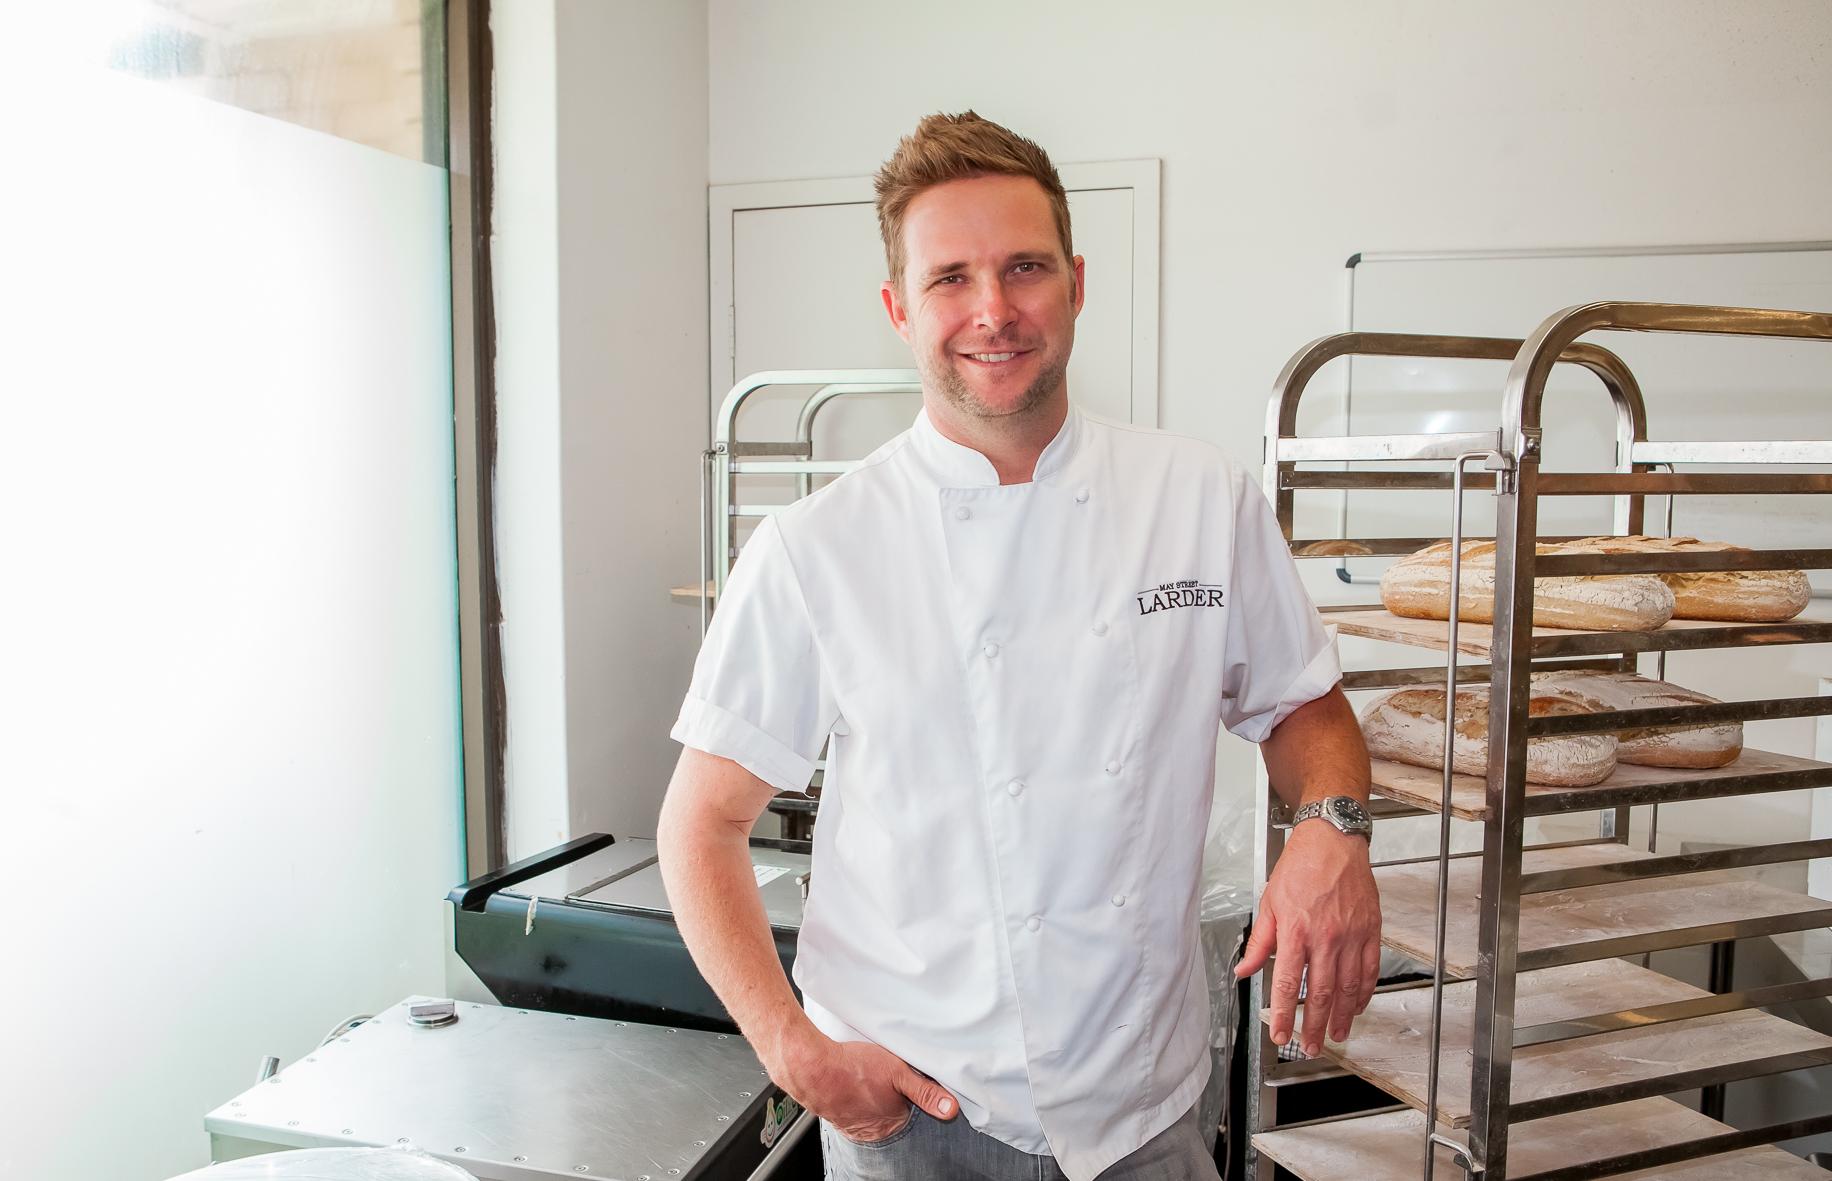 Kombucha Larder Series with Executive Chef Scott Bridger